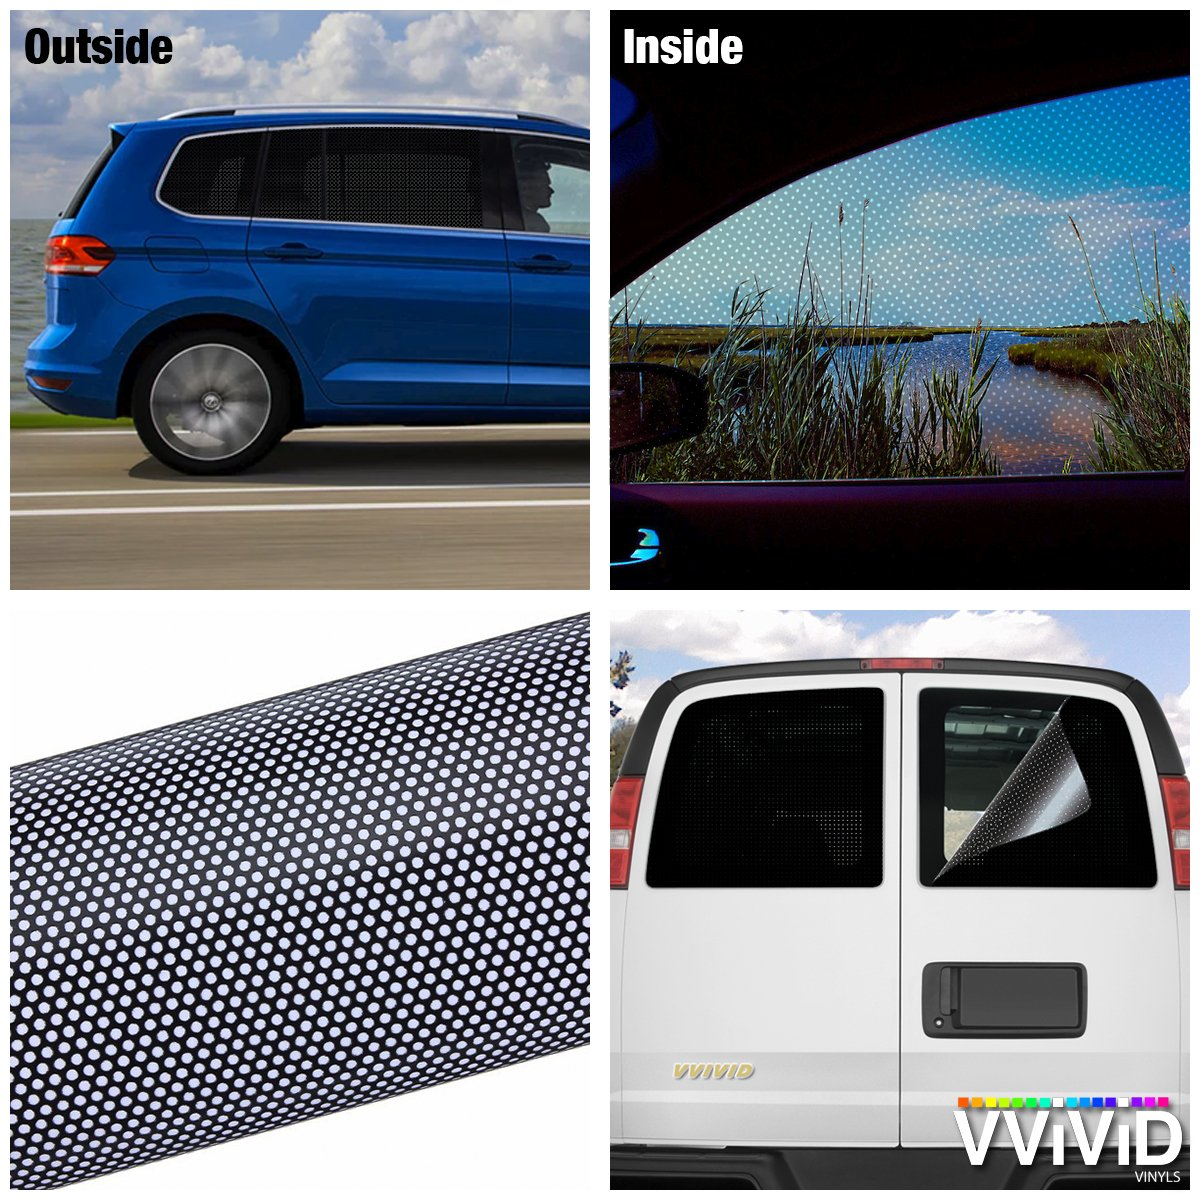 17.9 x 48 VViViD Black Perforated One-Way Vision Vinyl Automotive Window Wrap Roll